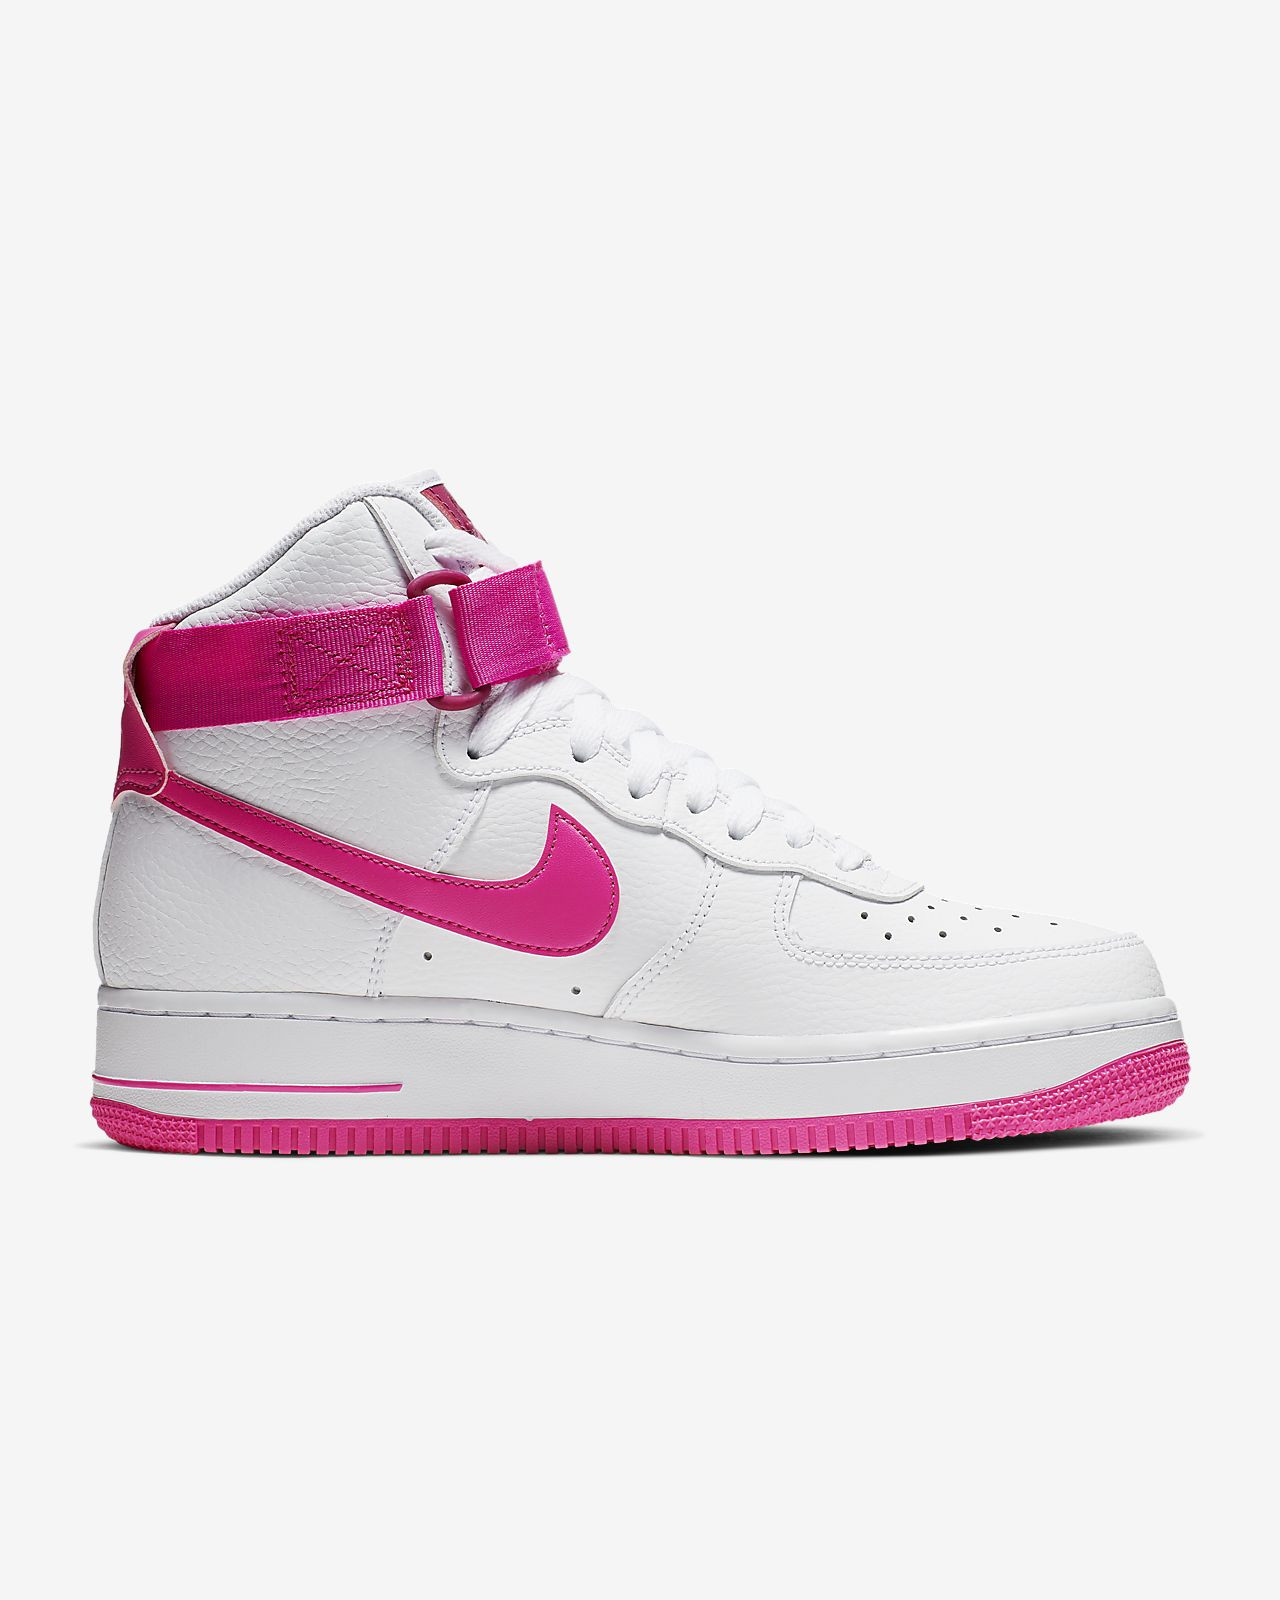 newest b3de0 043f1 Nike Air Force 1 High 08 LE